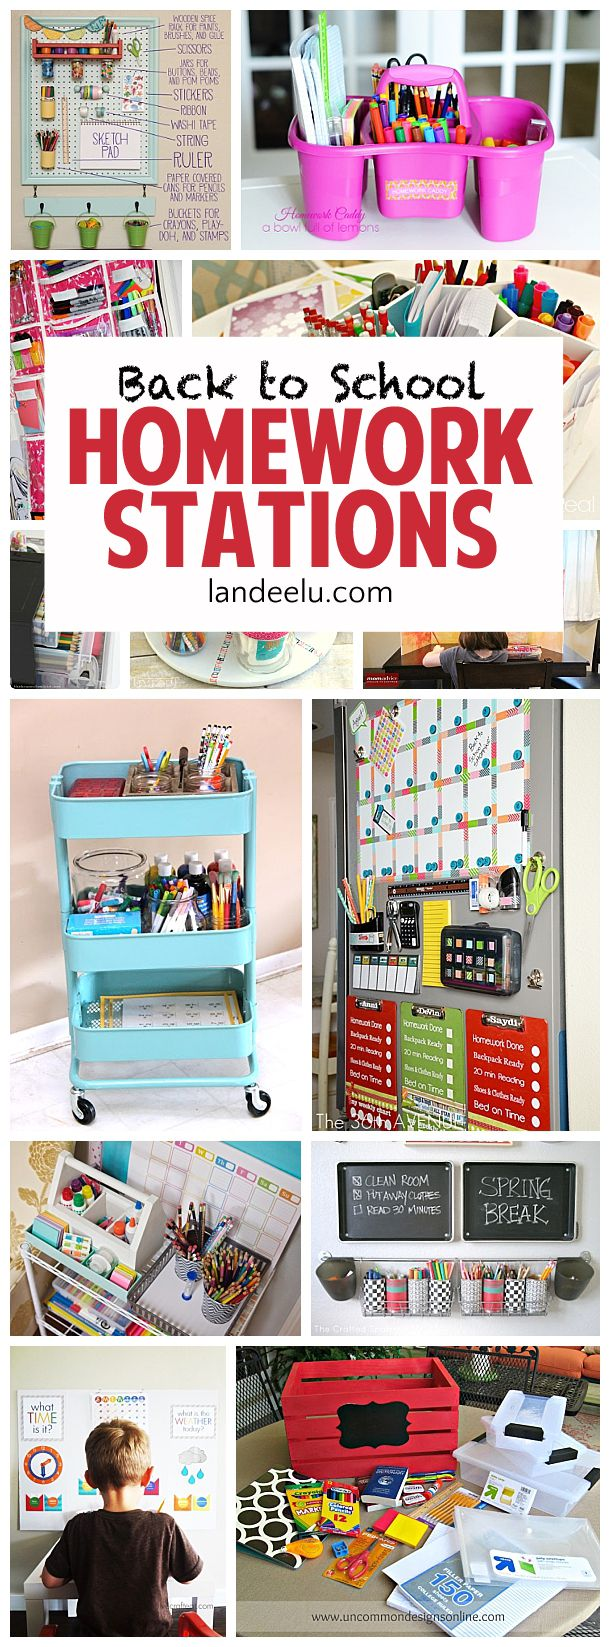 DIY Projects: DIY Back to School Homework Stations - landeelu.co...